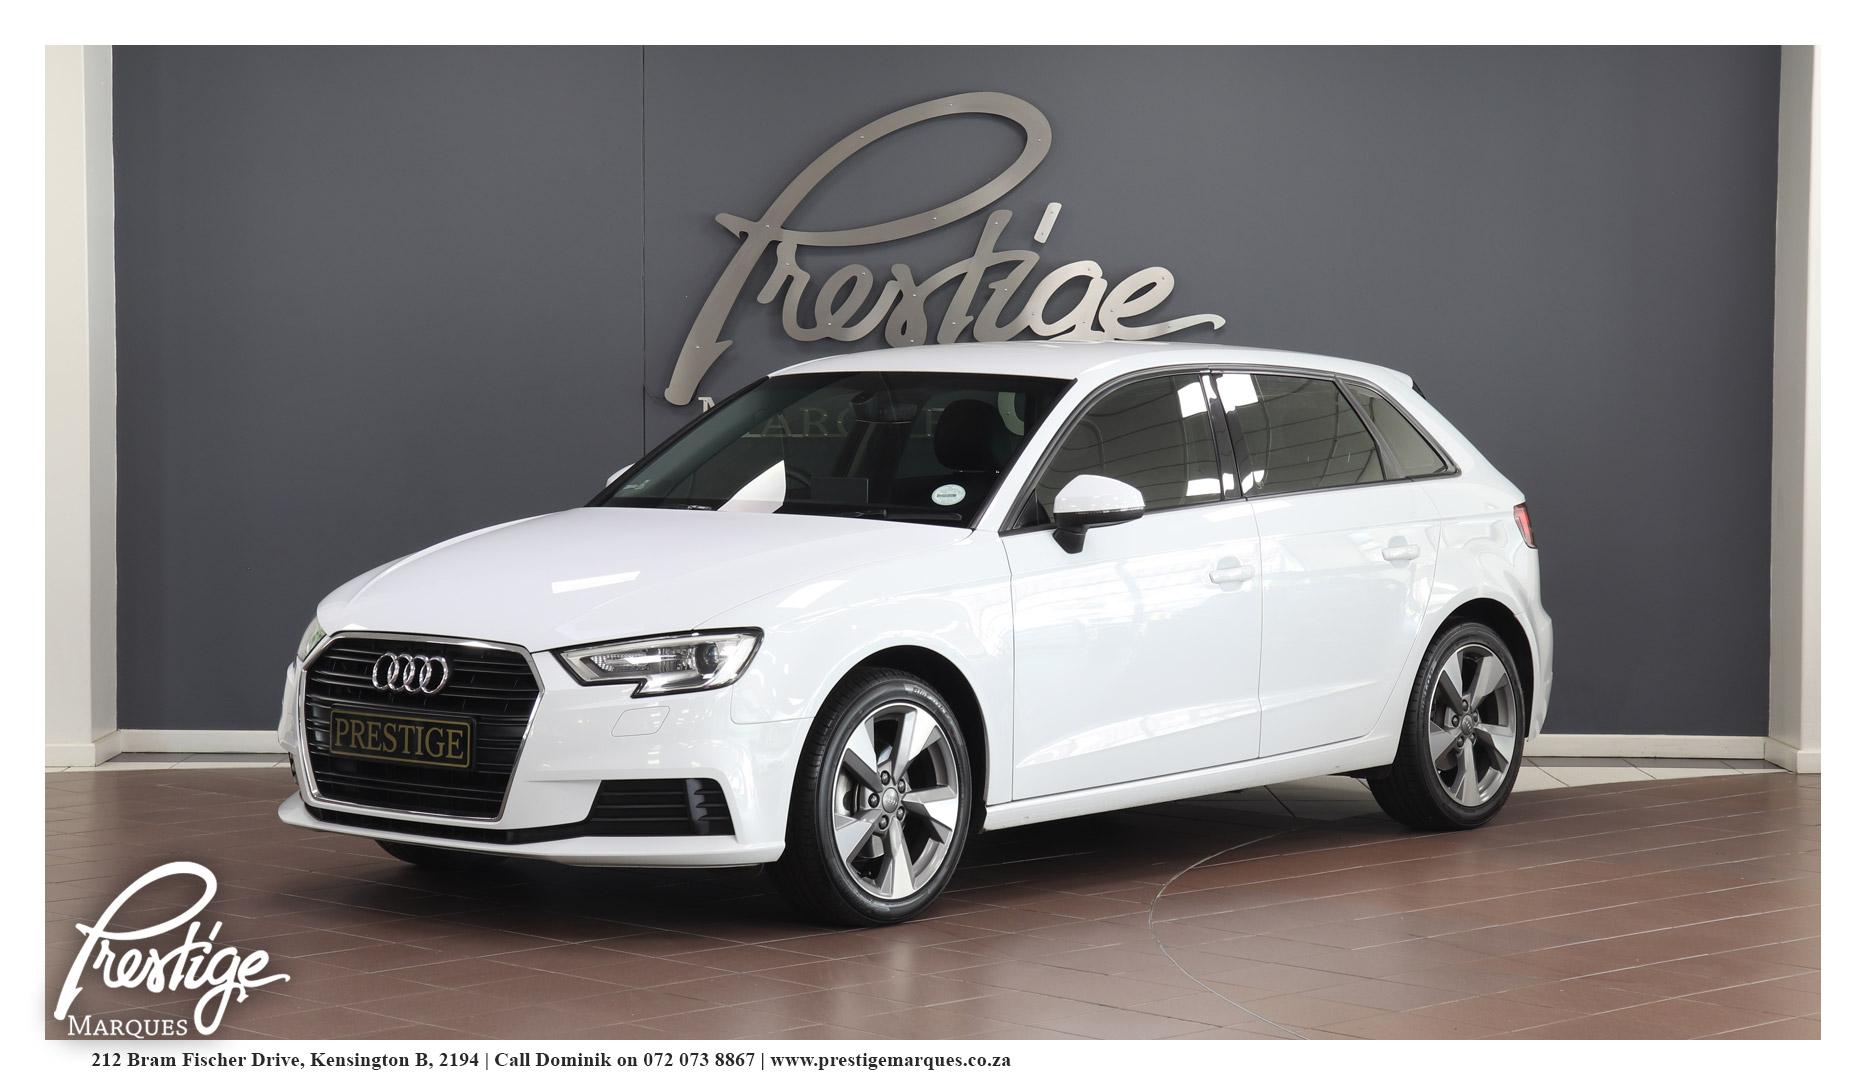 2017-Audi-A3-Sportback-1-4-TFSi-Stronic-Prestige-Marques-Randburg-Sandton-8